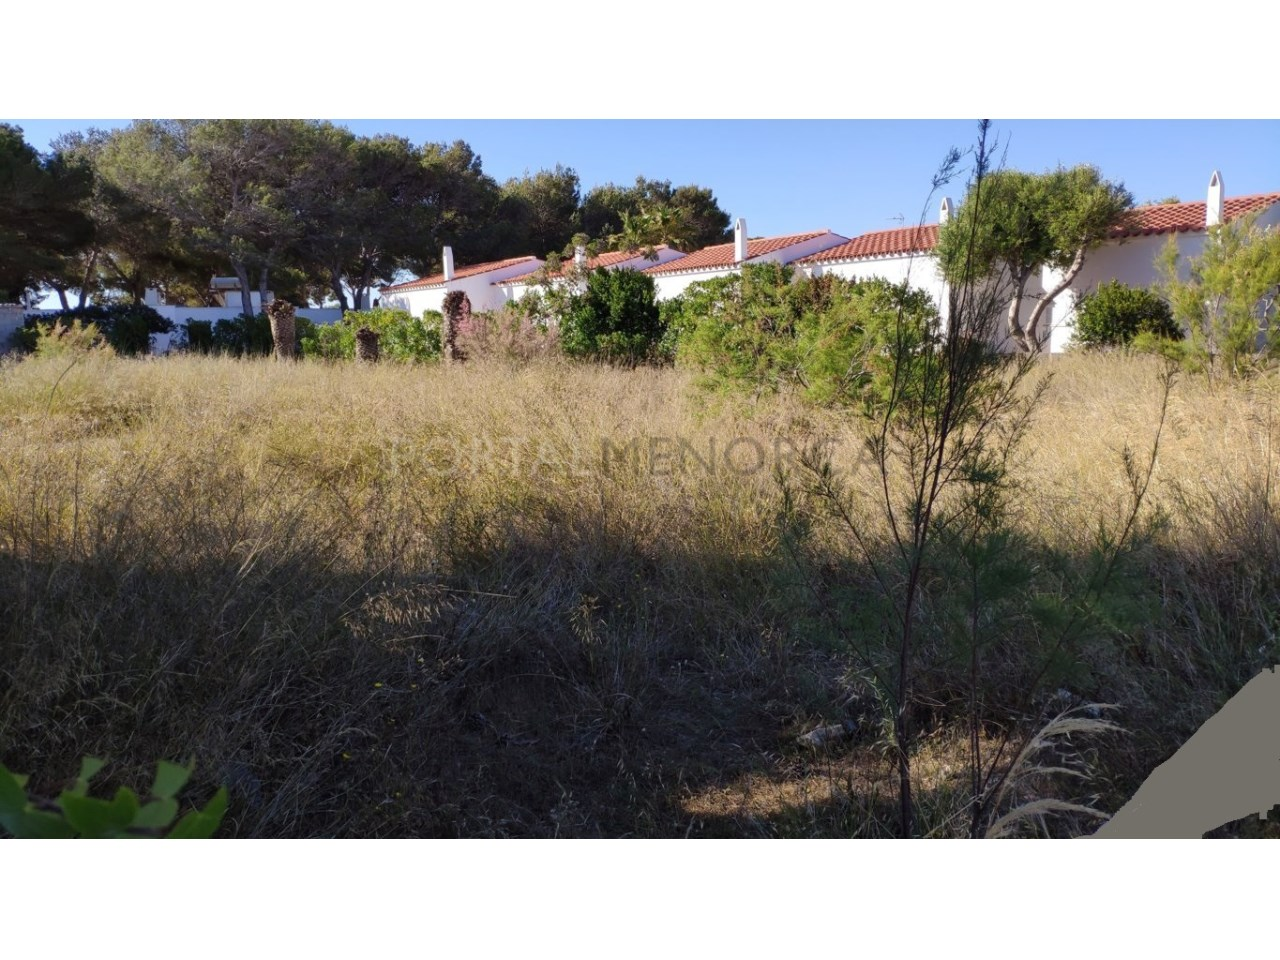 Plot for sale in Calan Blanes, Ciutadella